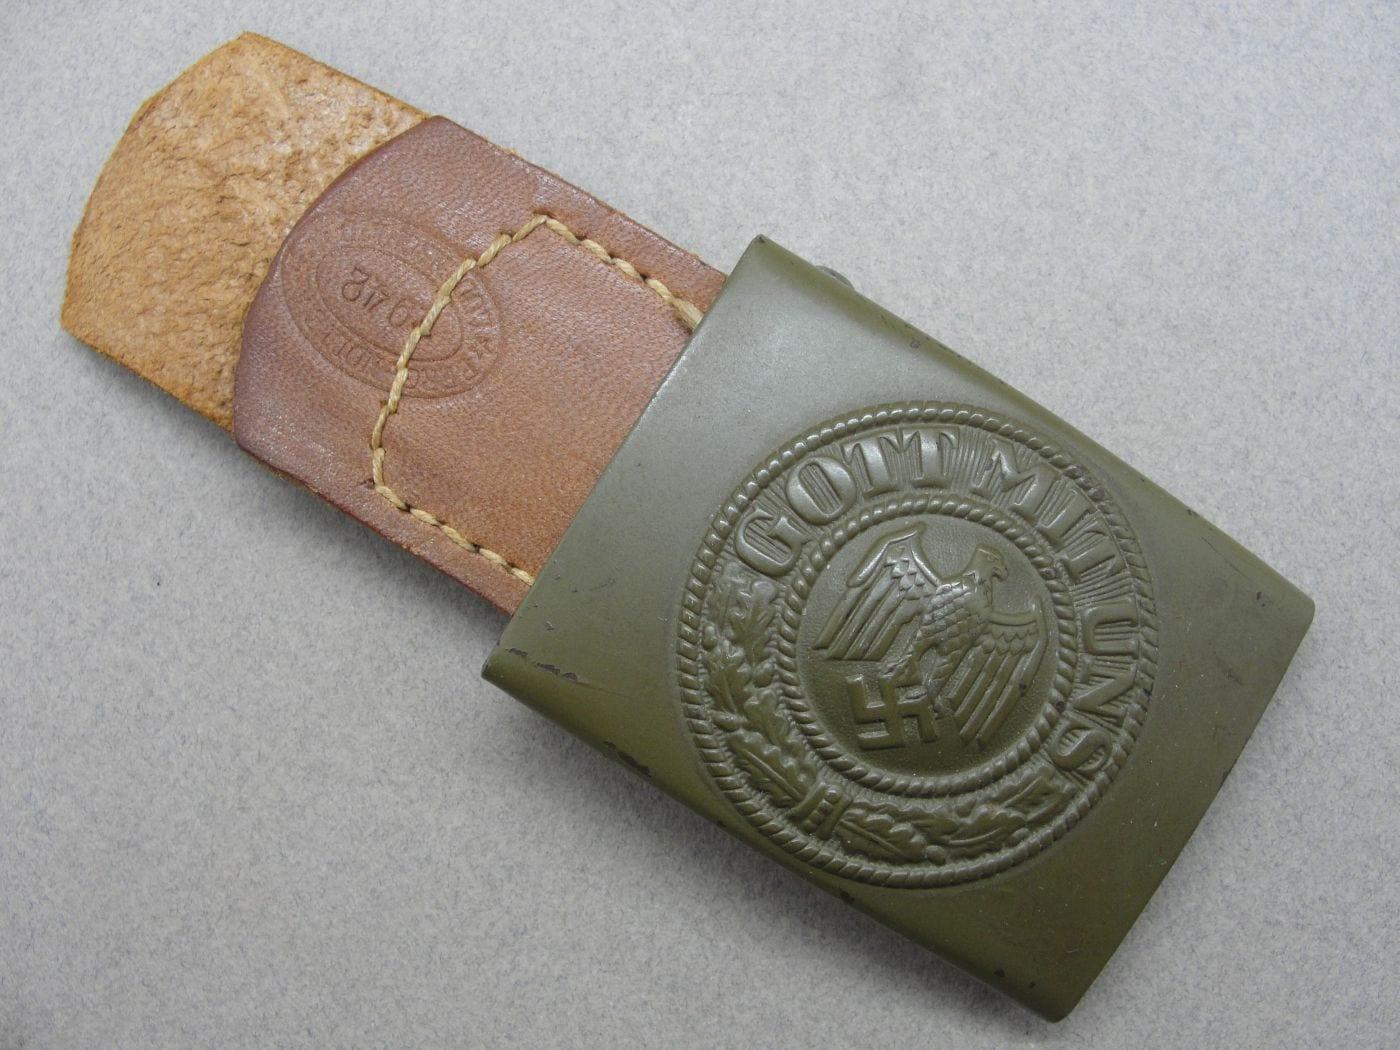 Army EM/NCOs Belt Buckle by Berg & Nolte